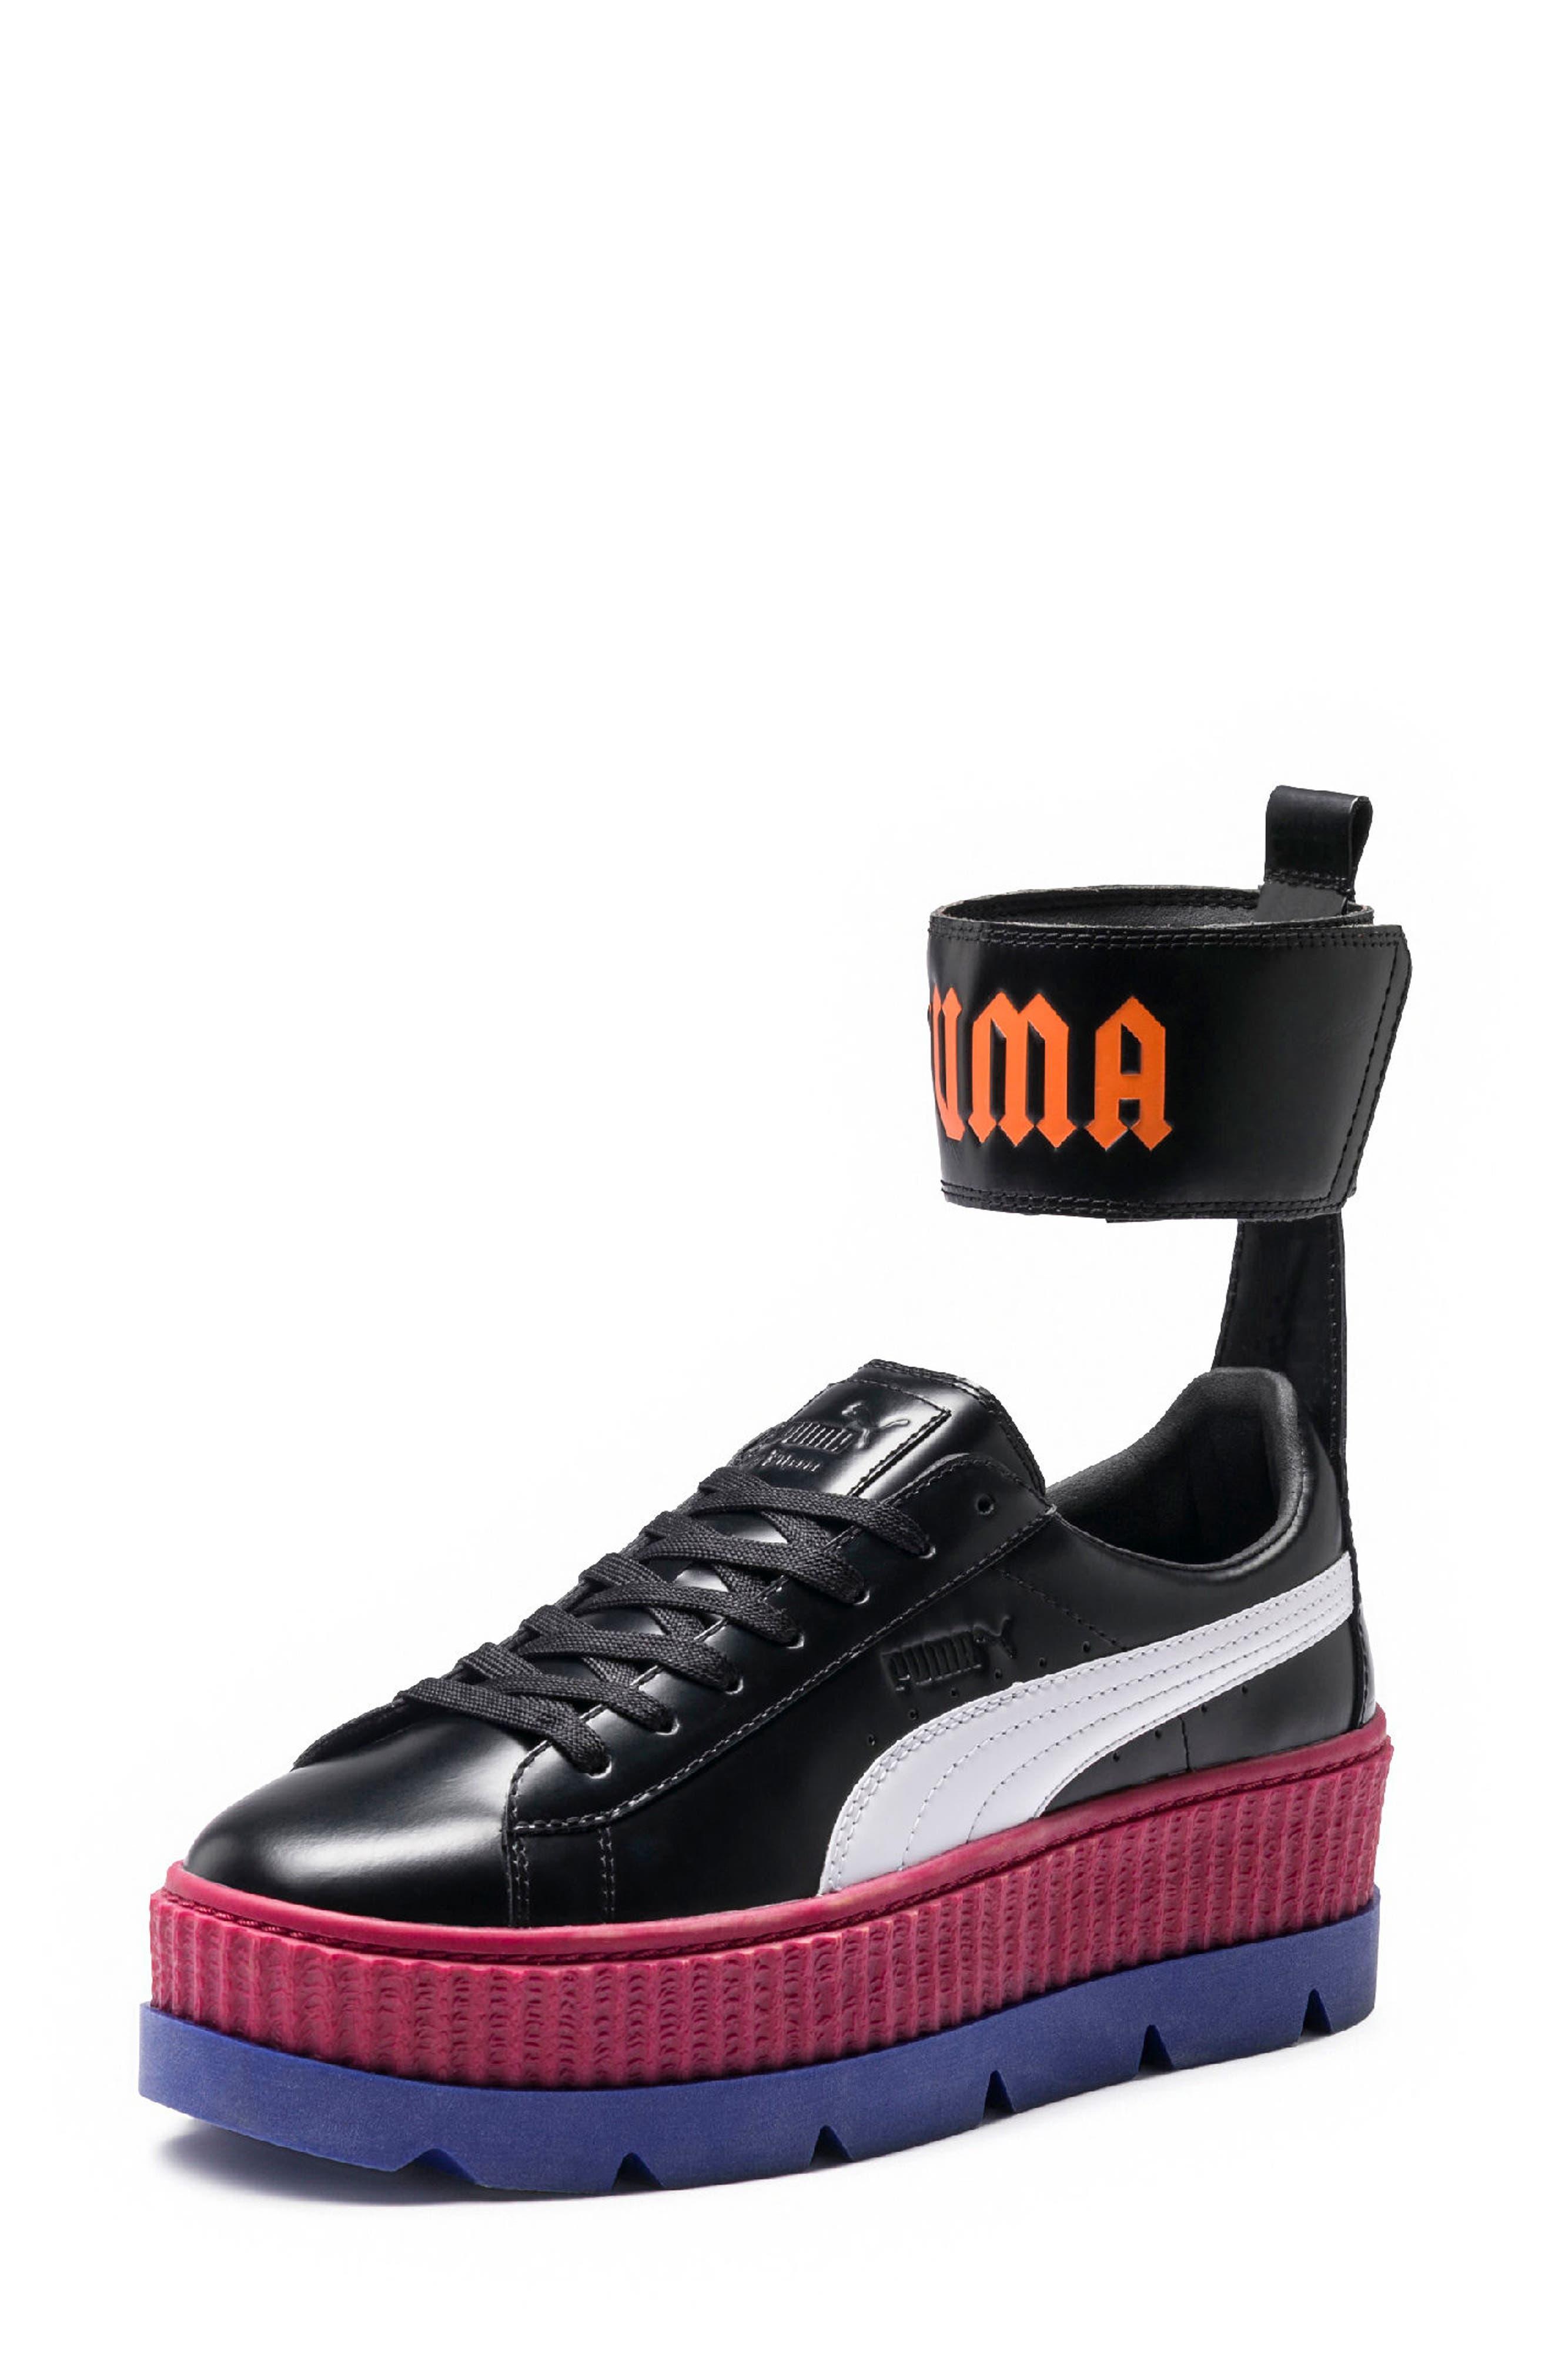 FENTY PUMA by Rihanna Ankle Strap Creeper Sneaker,                         Main,                         color, 001